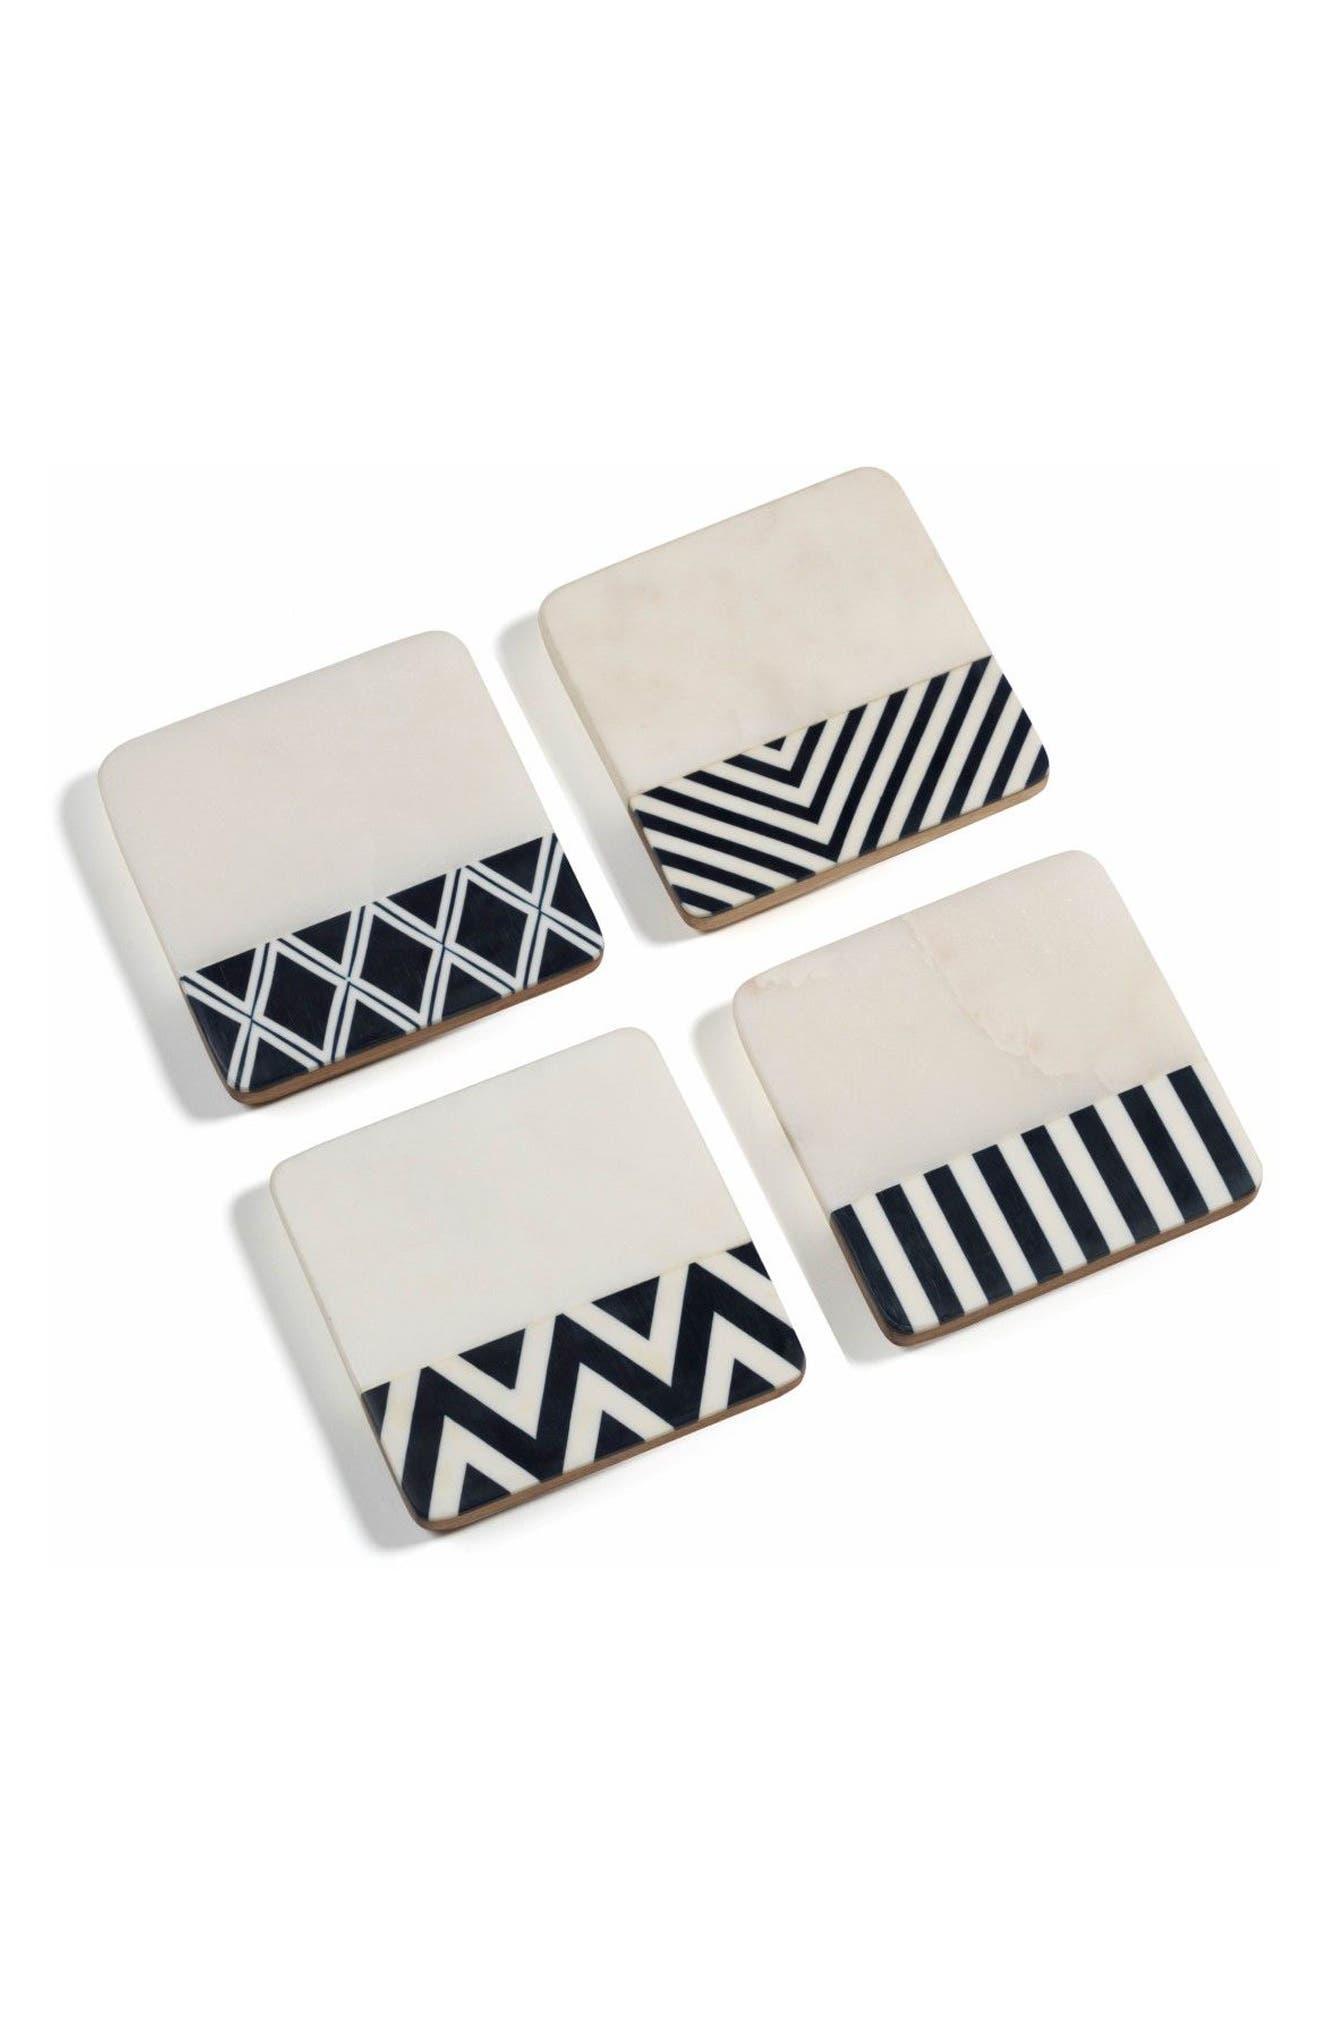 Marine Set of 4 Wood & Marble Coasters,                             Main thumbnail 1, color,                             WHITE/ GREY/ BLACK